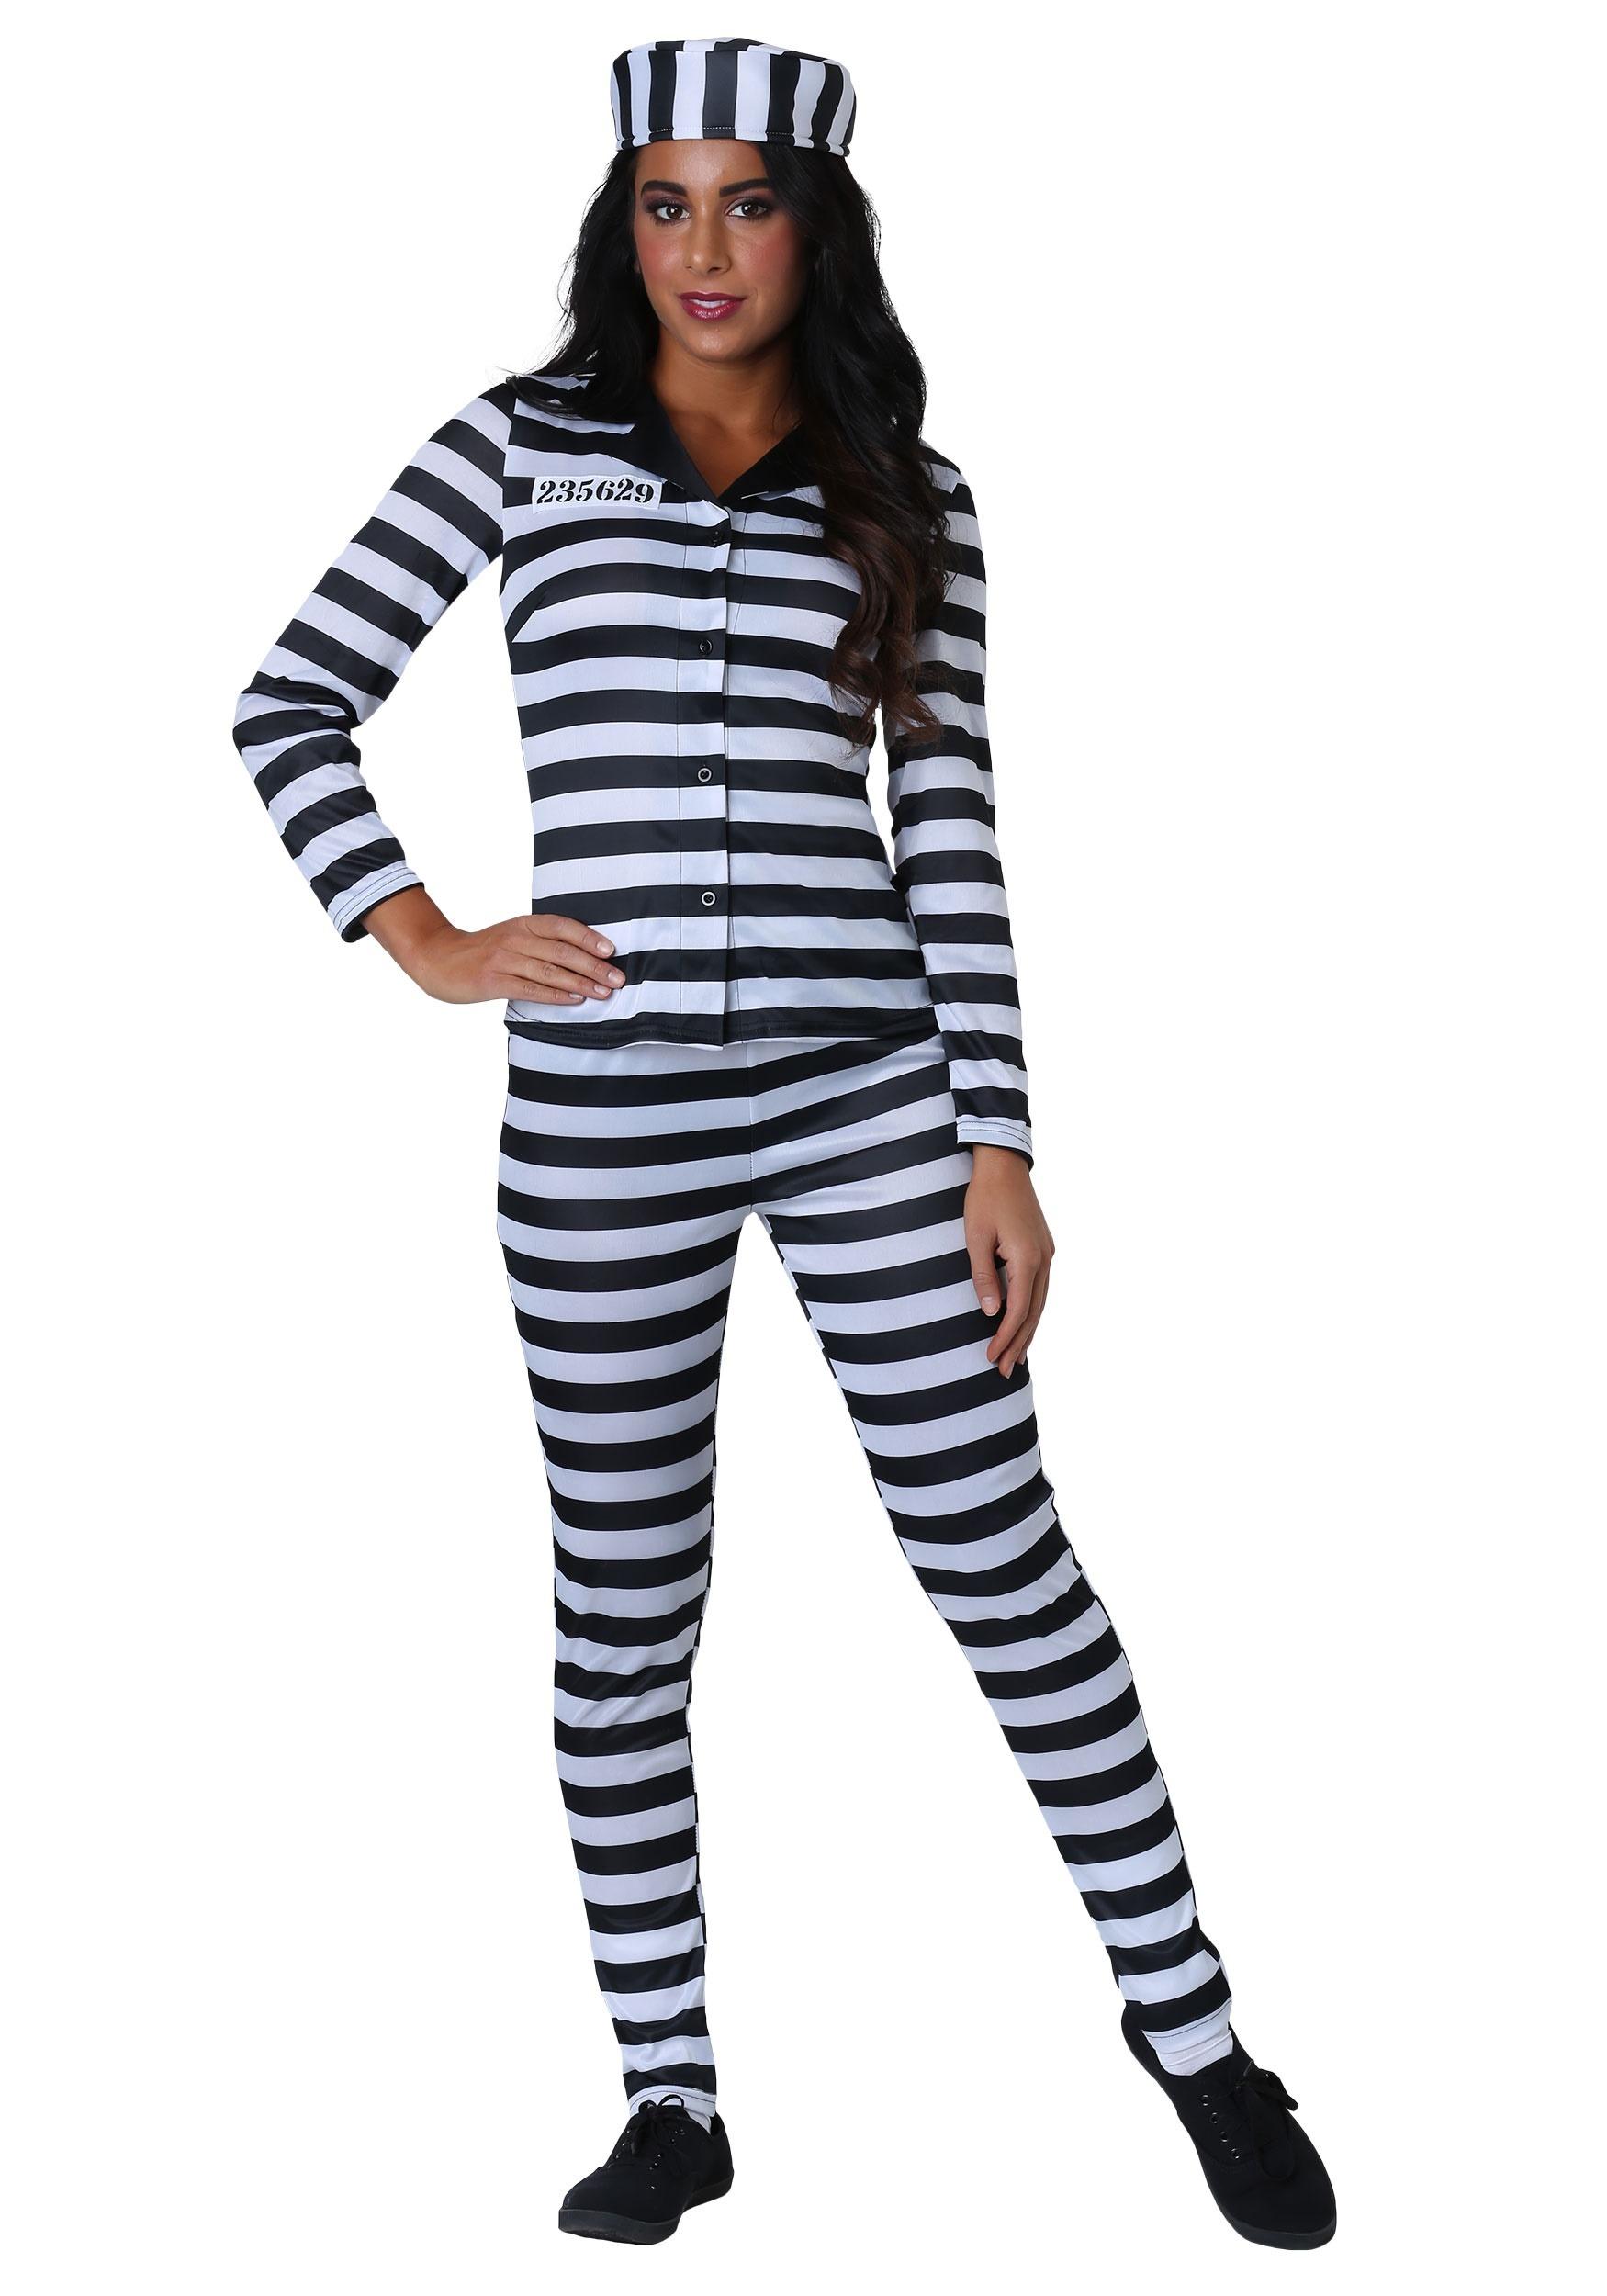 Plus Size Incarcerated Cutie Women's Costume